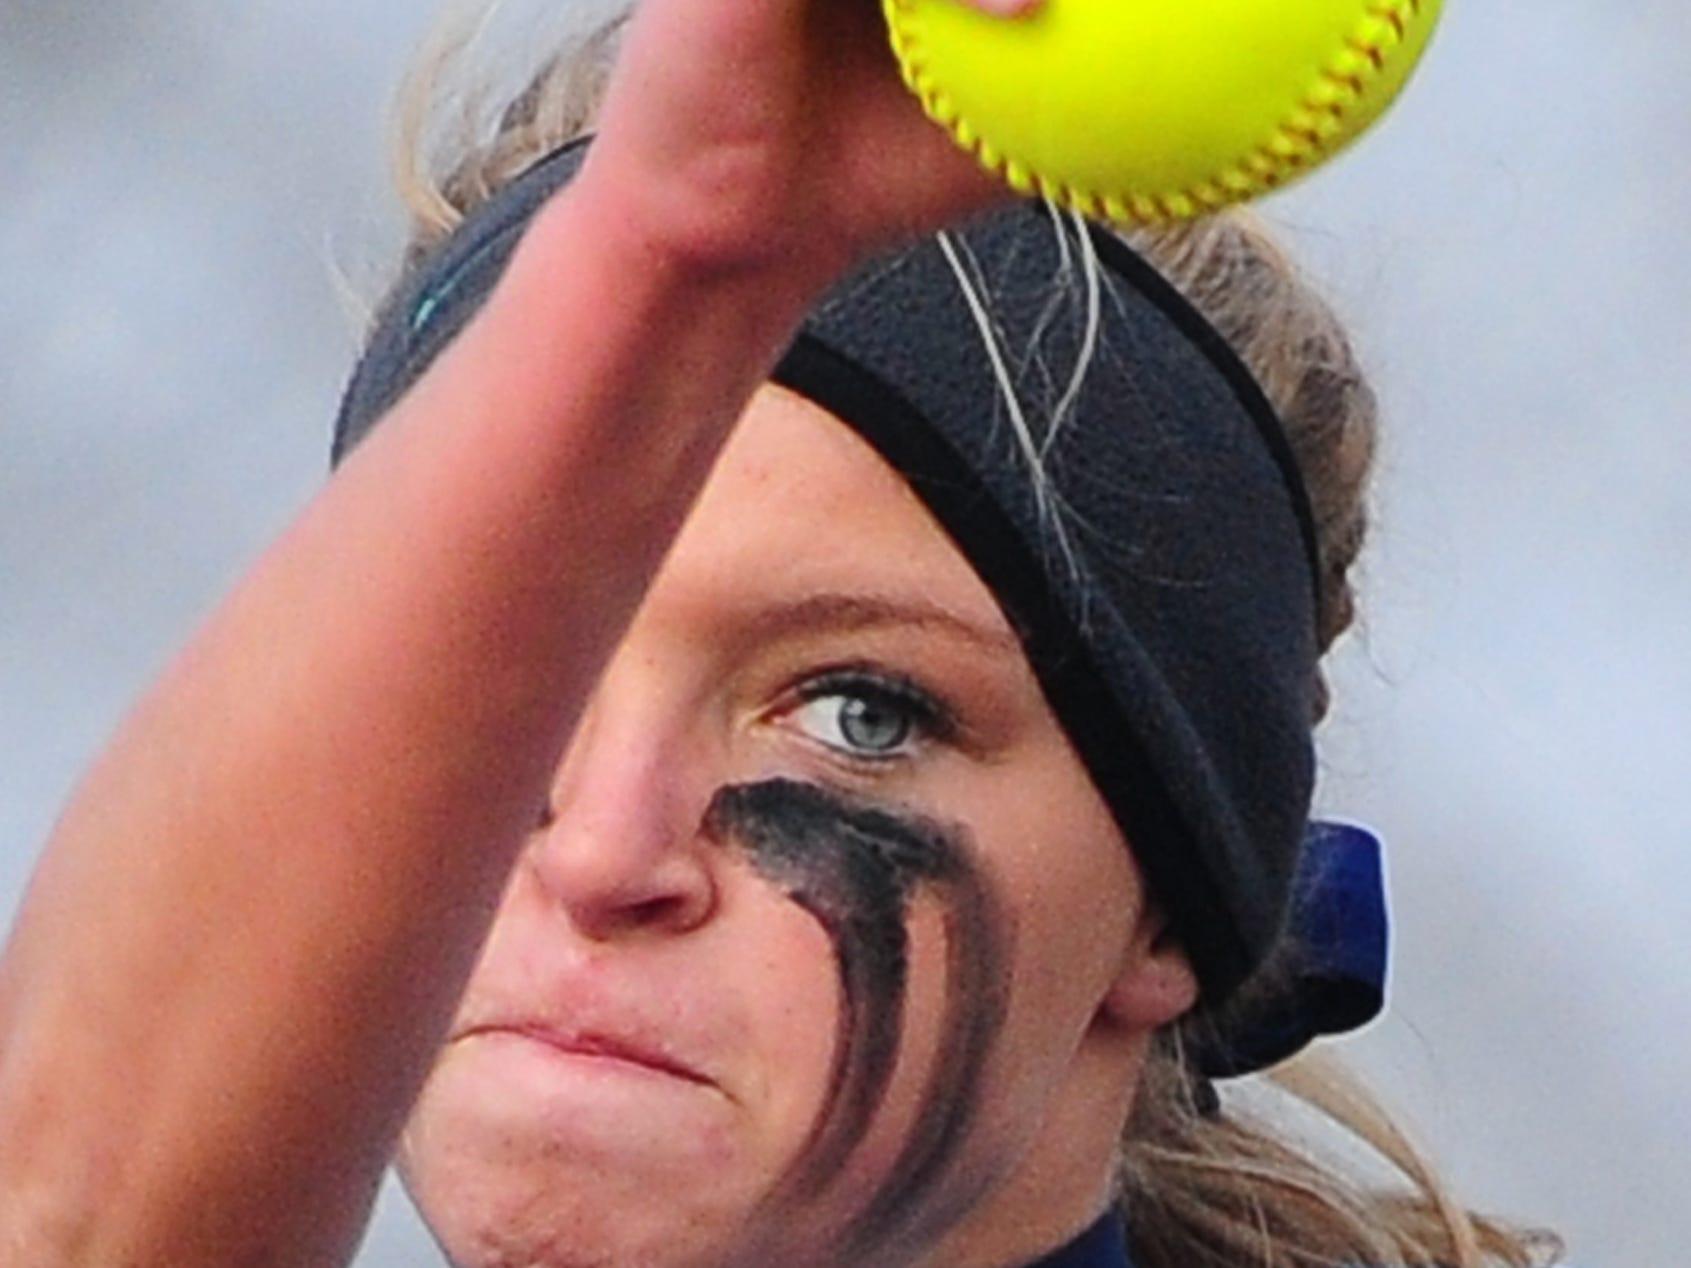 Bay Port pitcher Bailey Smaney winds up against Pulaski in a FRCC softball game at Bay Port High School, Thursday, April 17, 2014. H. Marc Larson/Press-Gazette Media